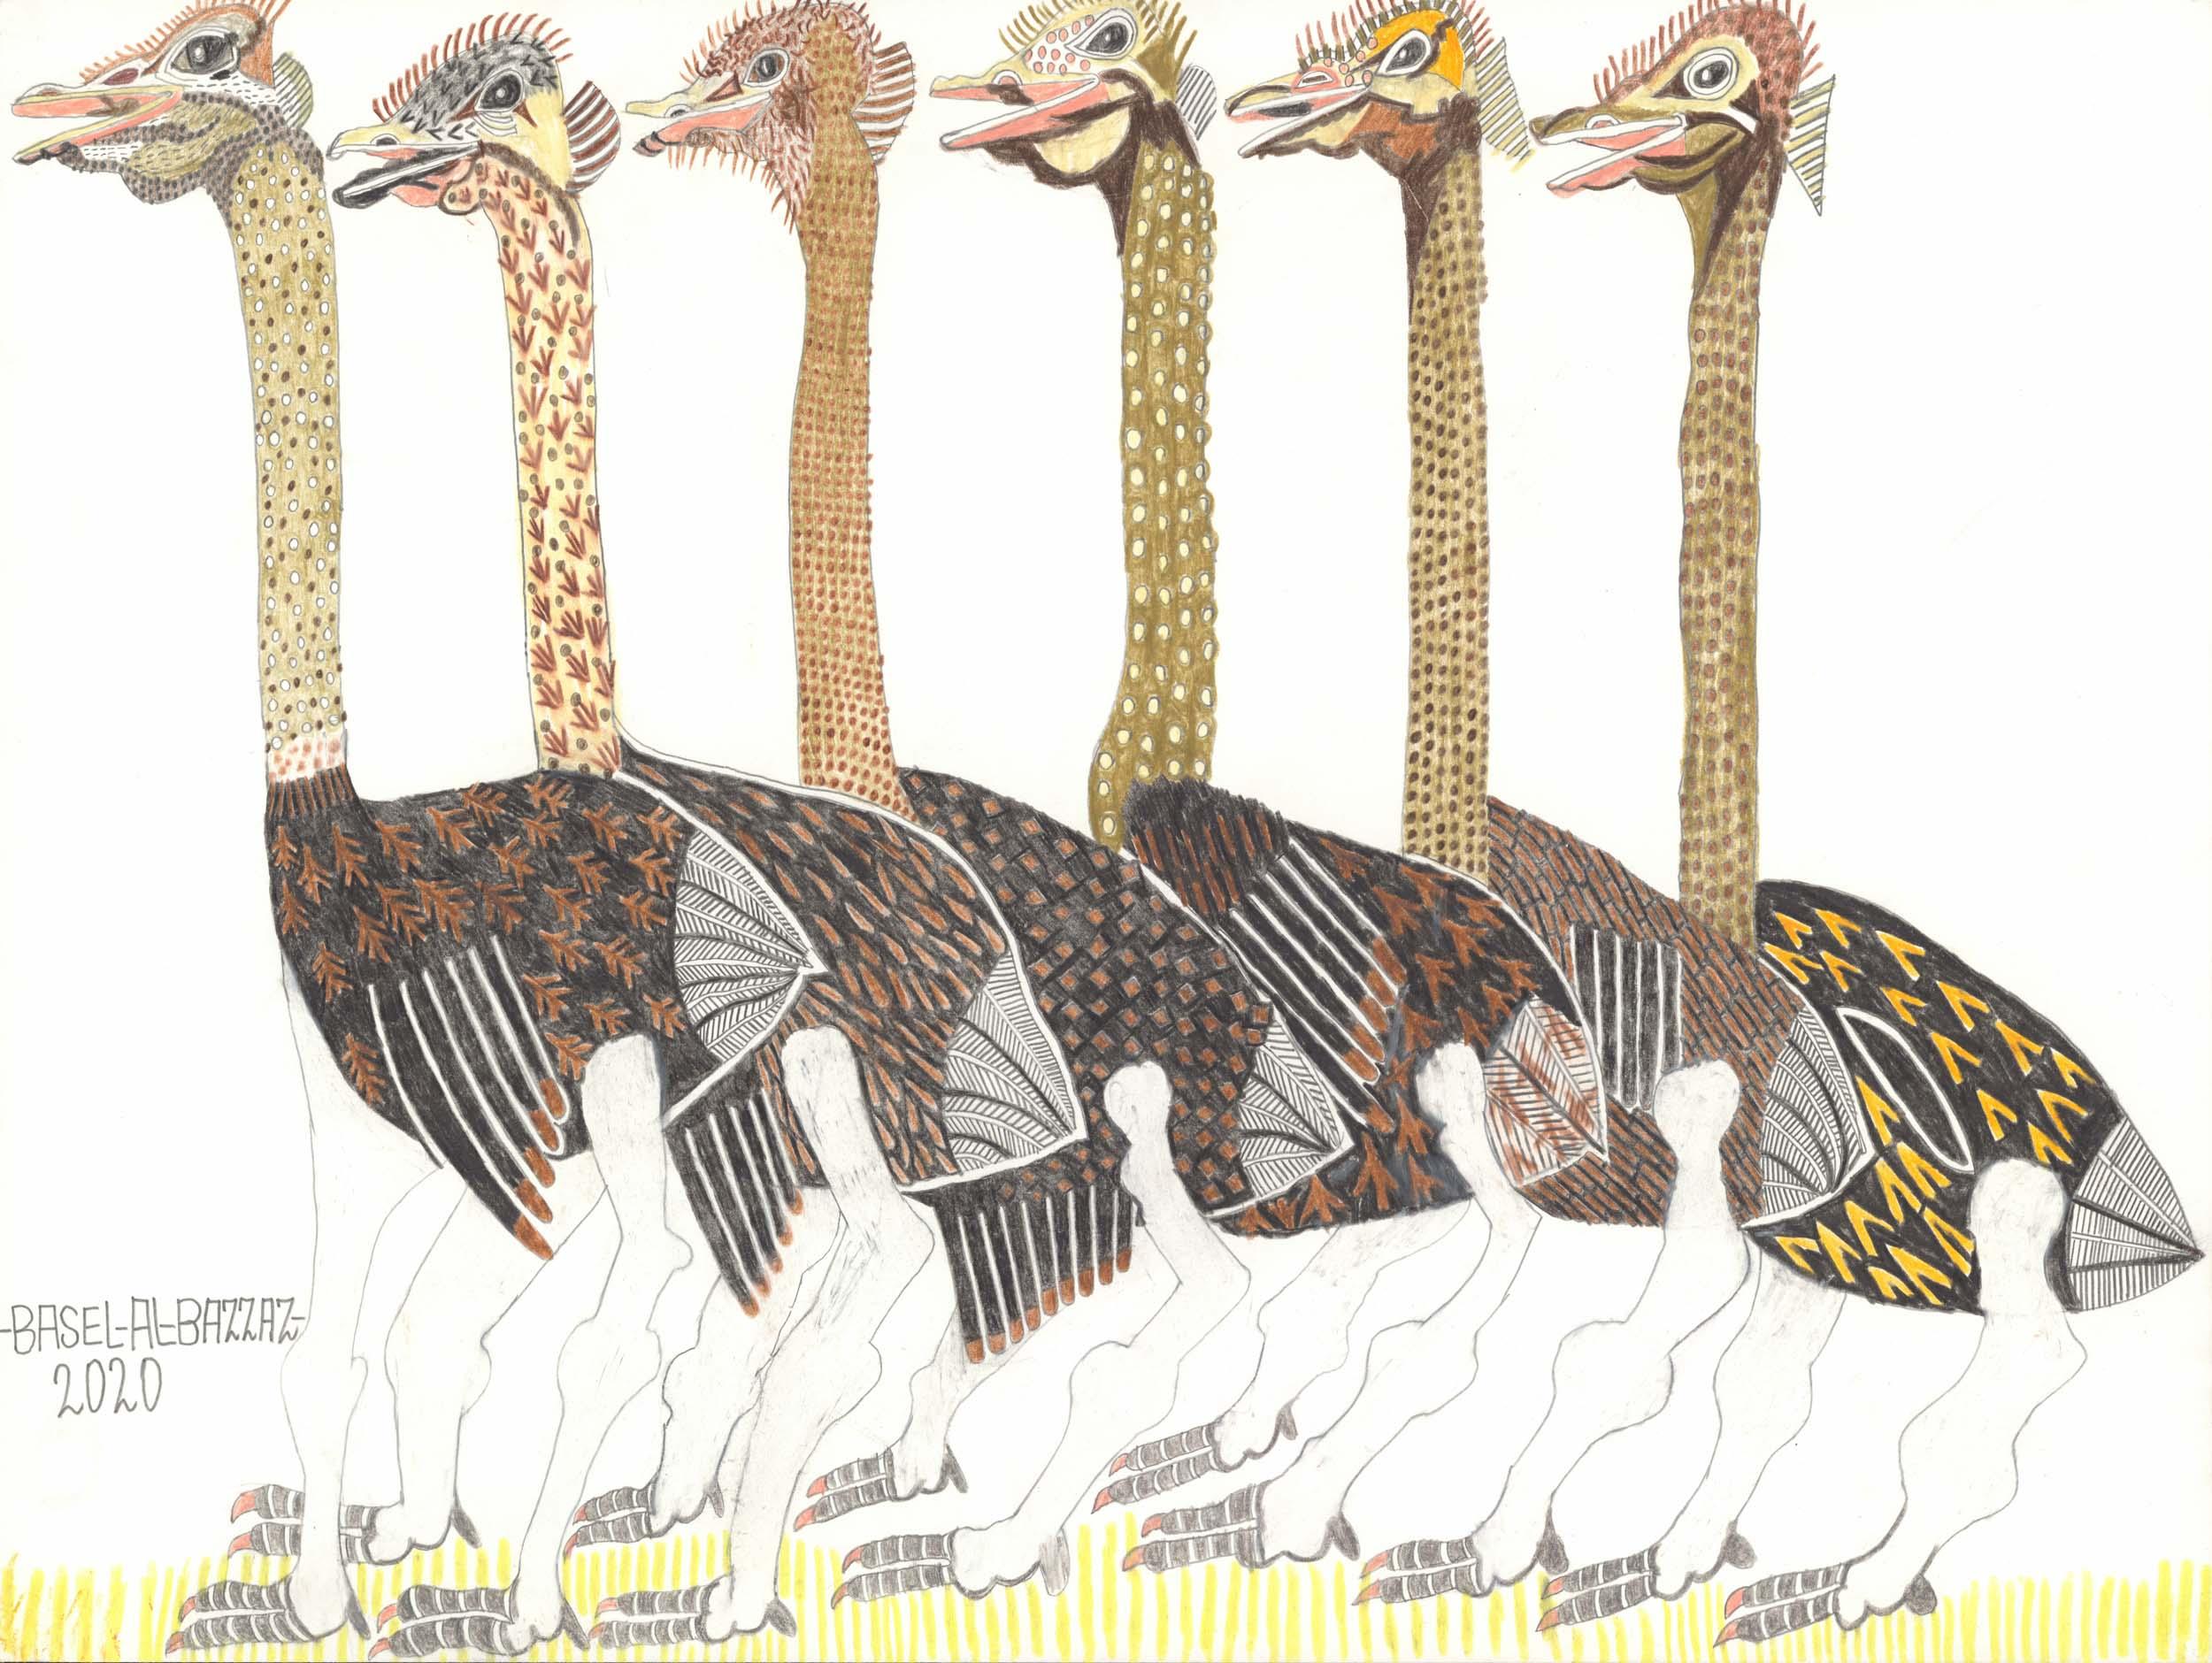 al-bazzaz basel - Vogel Sträuße / Ostriches